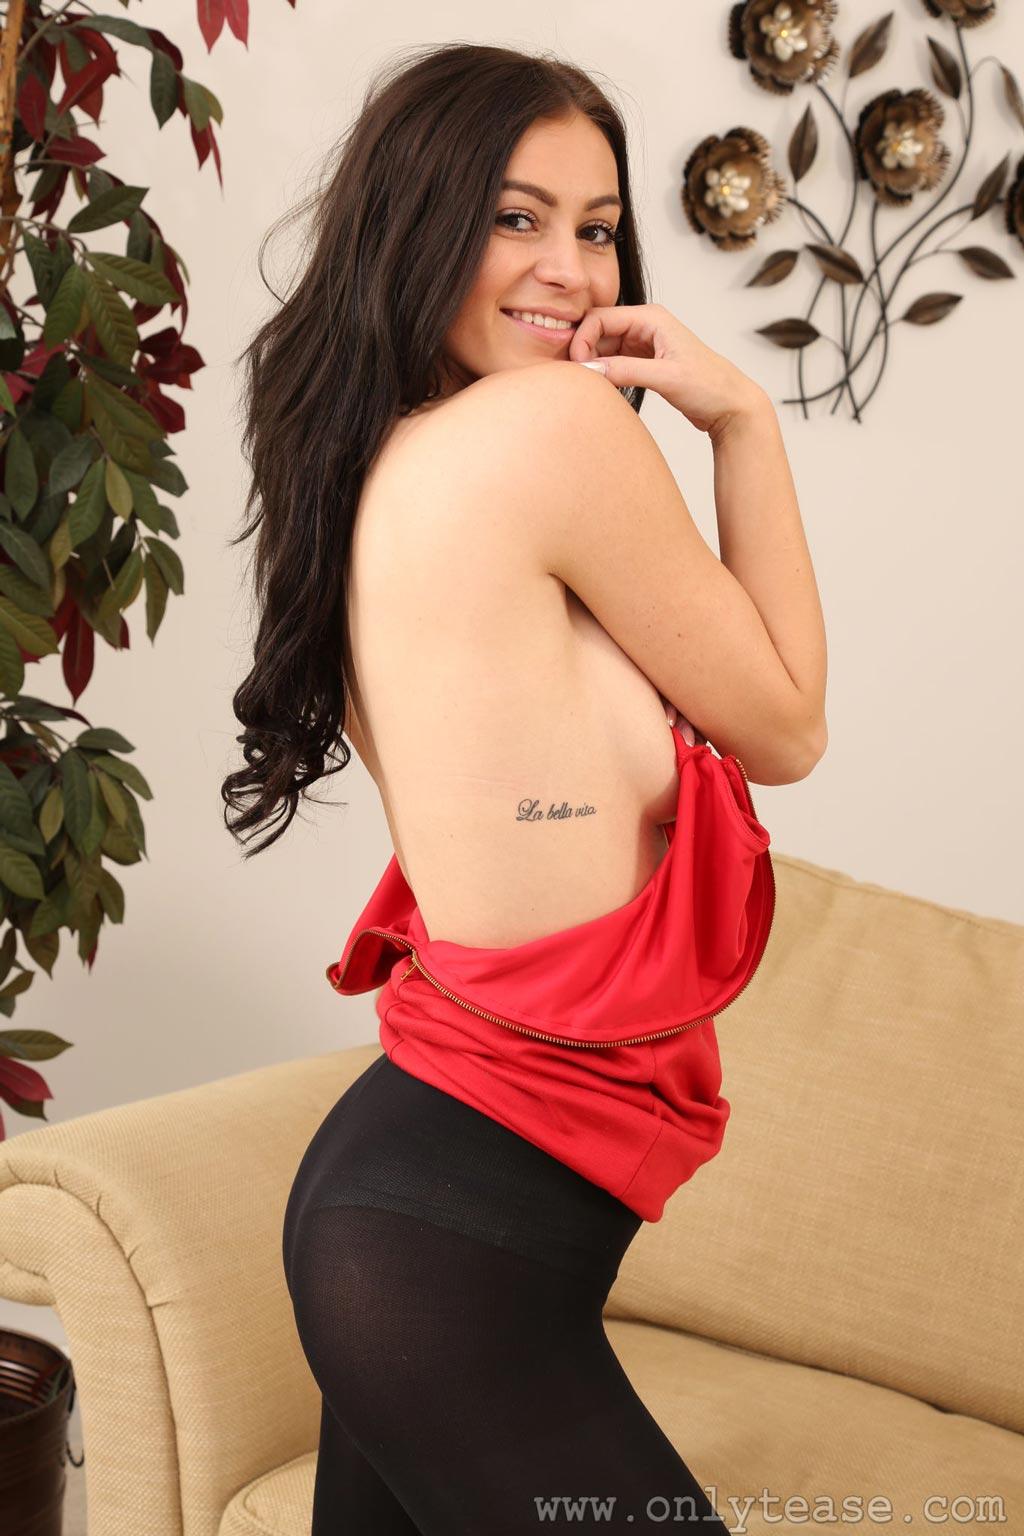 Rachel nichols naked pics